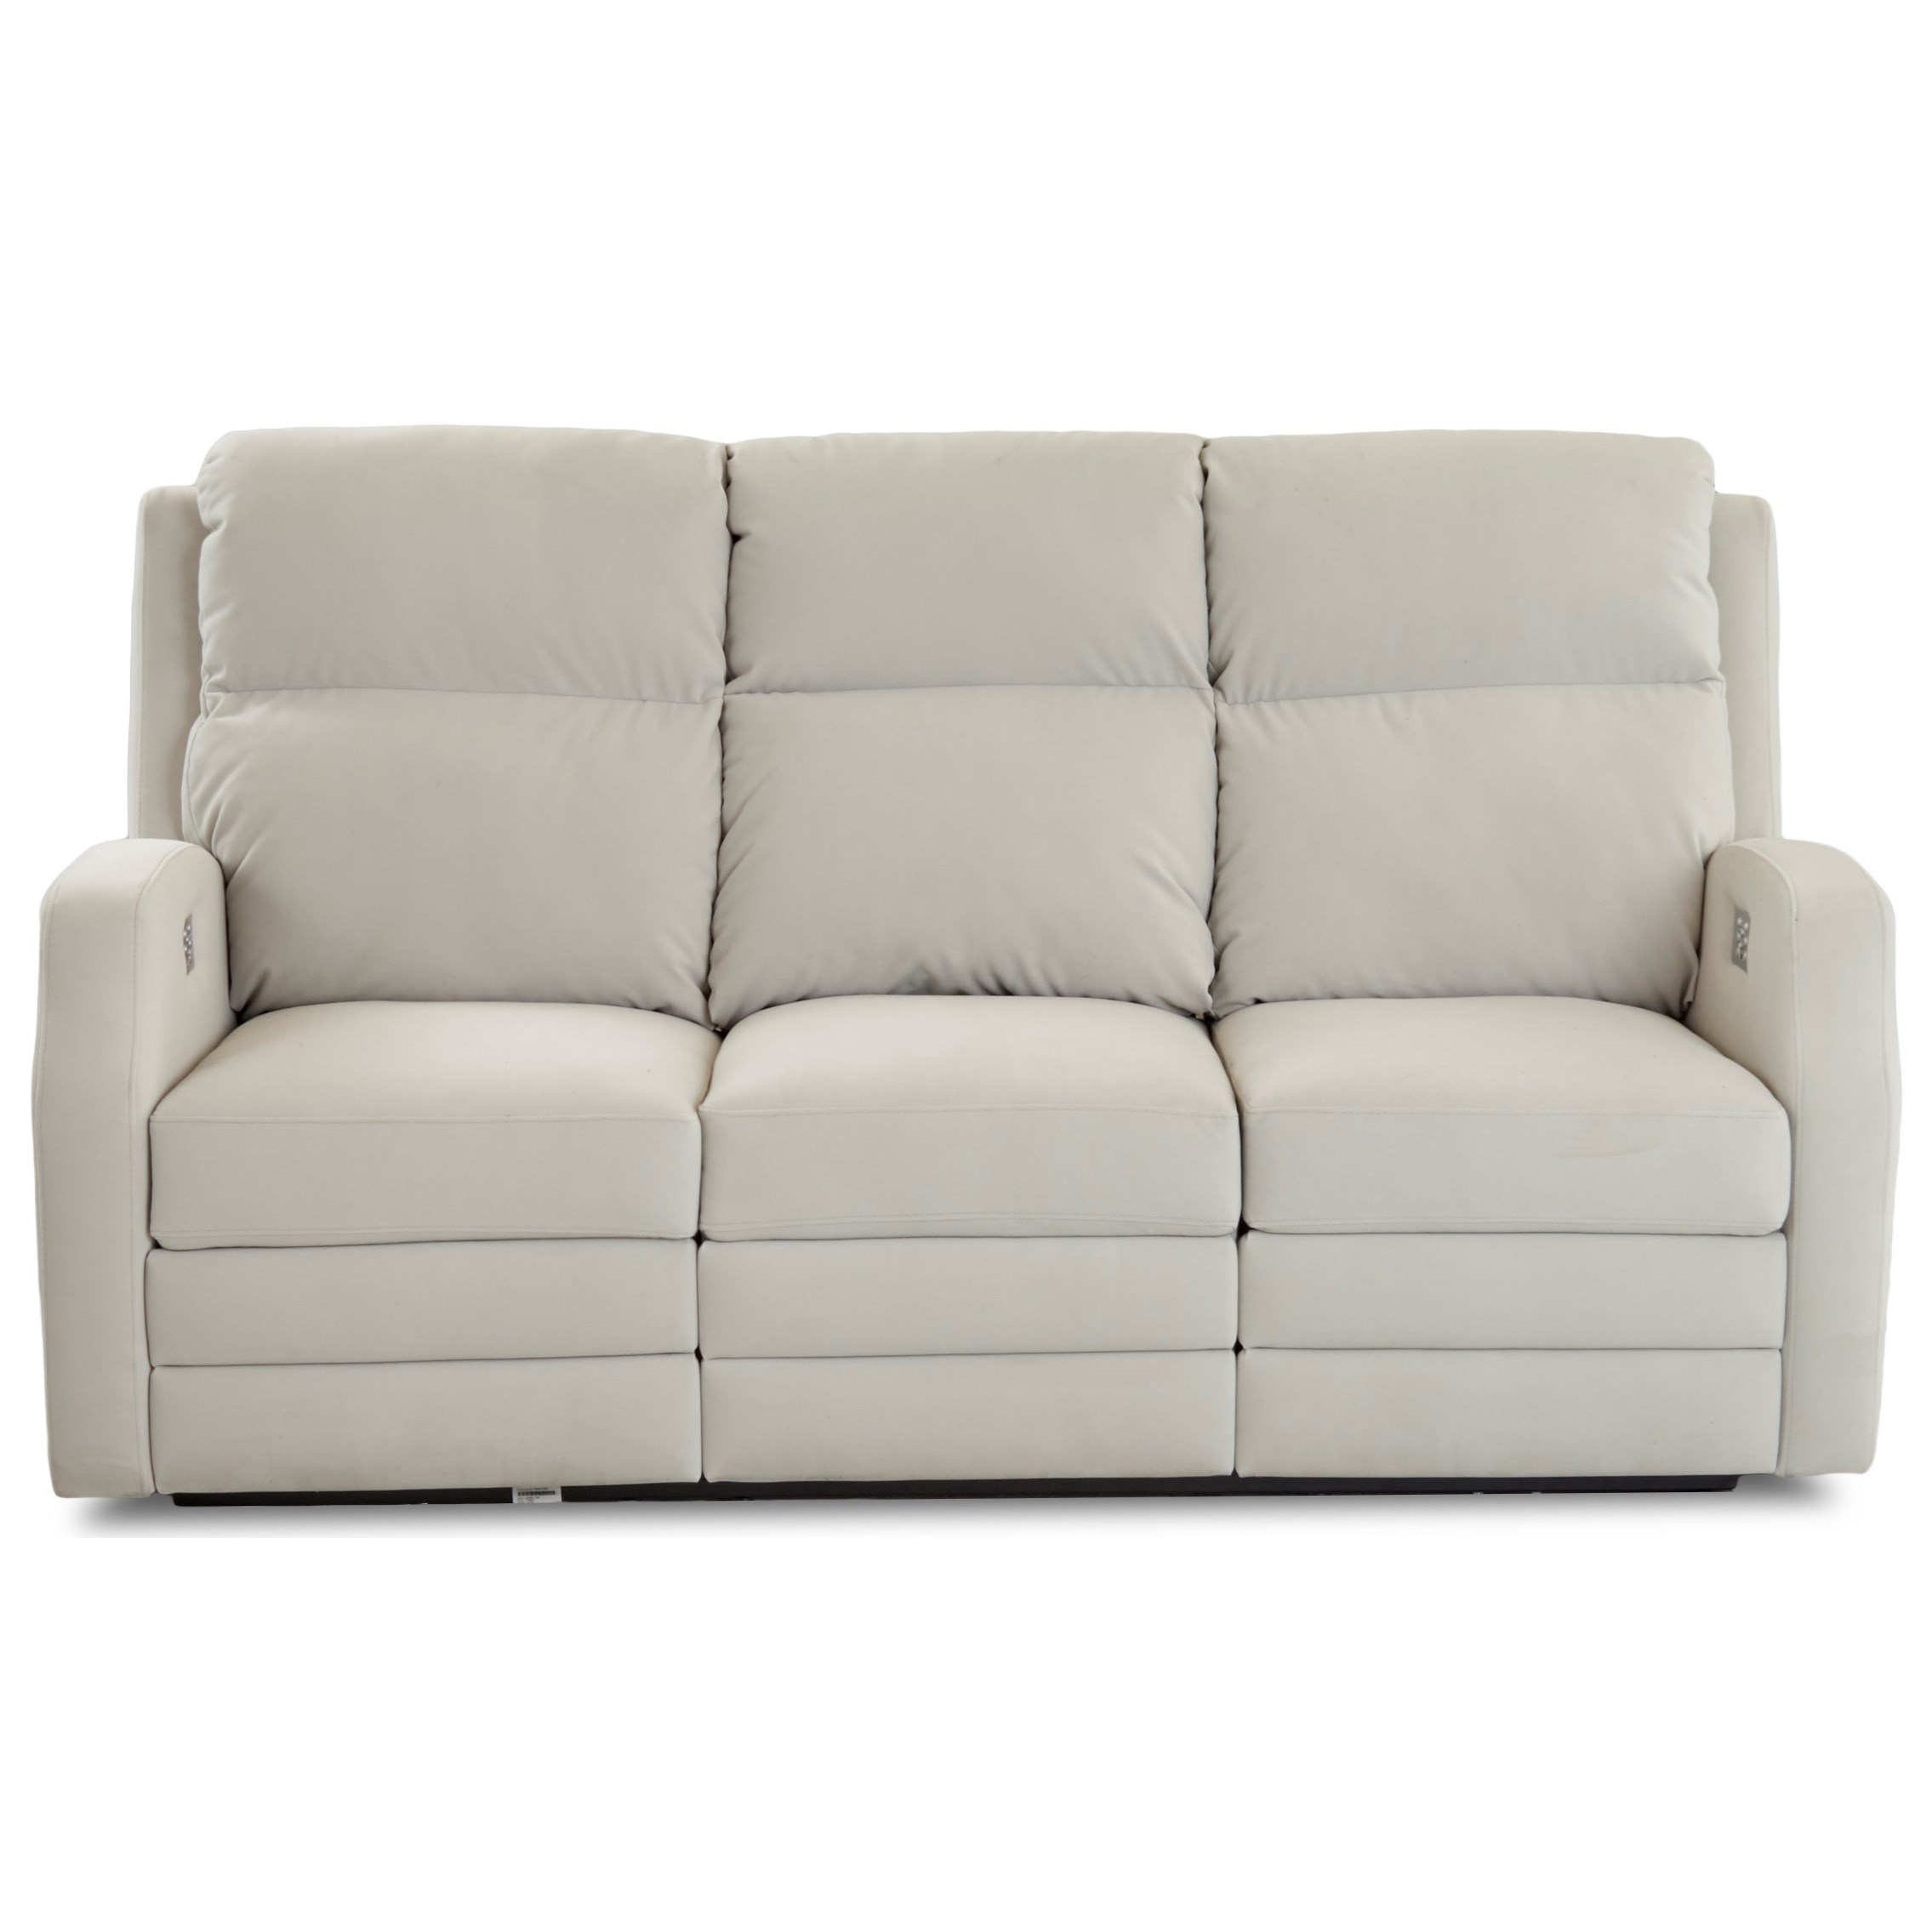 Klaussner Kamiah 77 Inch Reclining Sofa Jacksonville